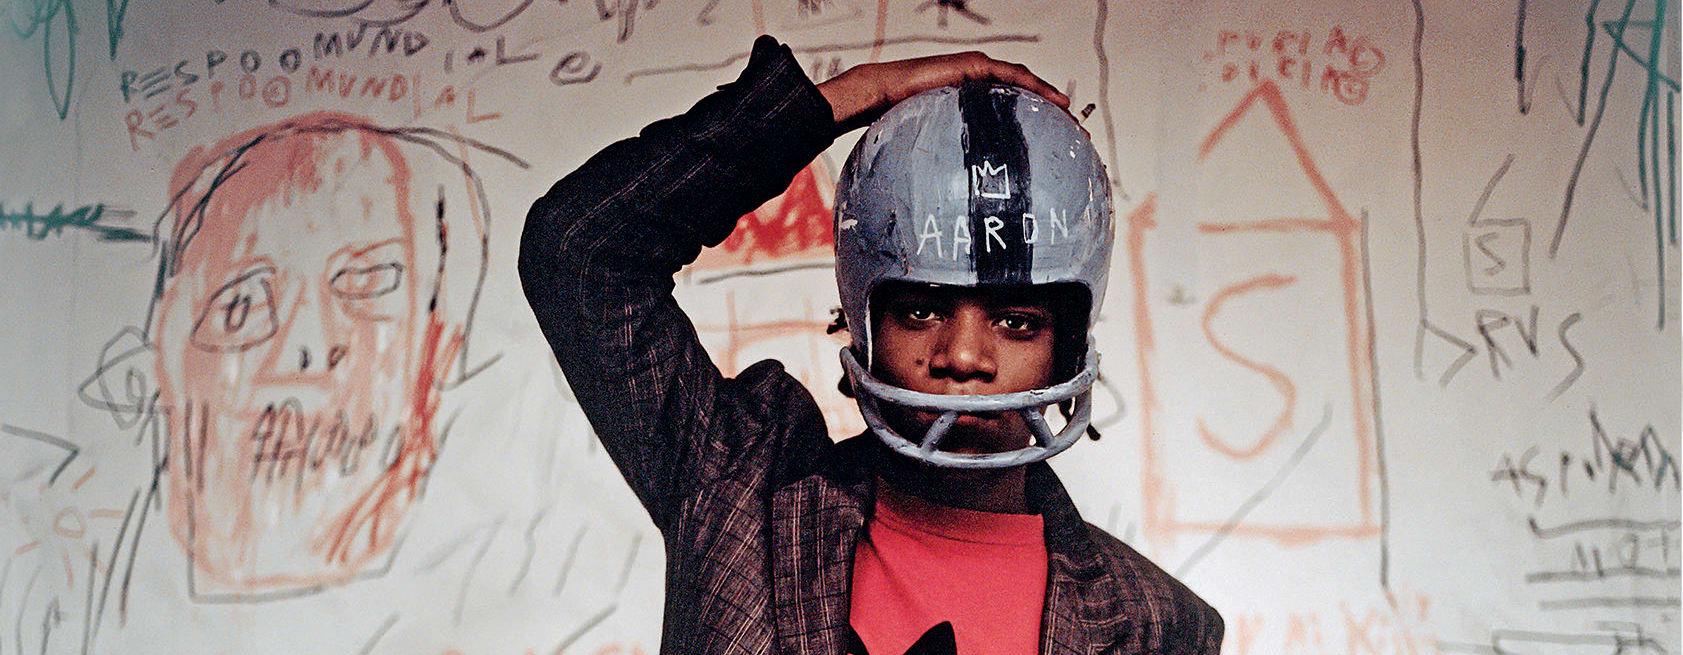 Graffiti as high art: Jean-Michel Basquiat